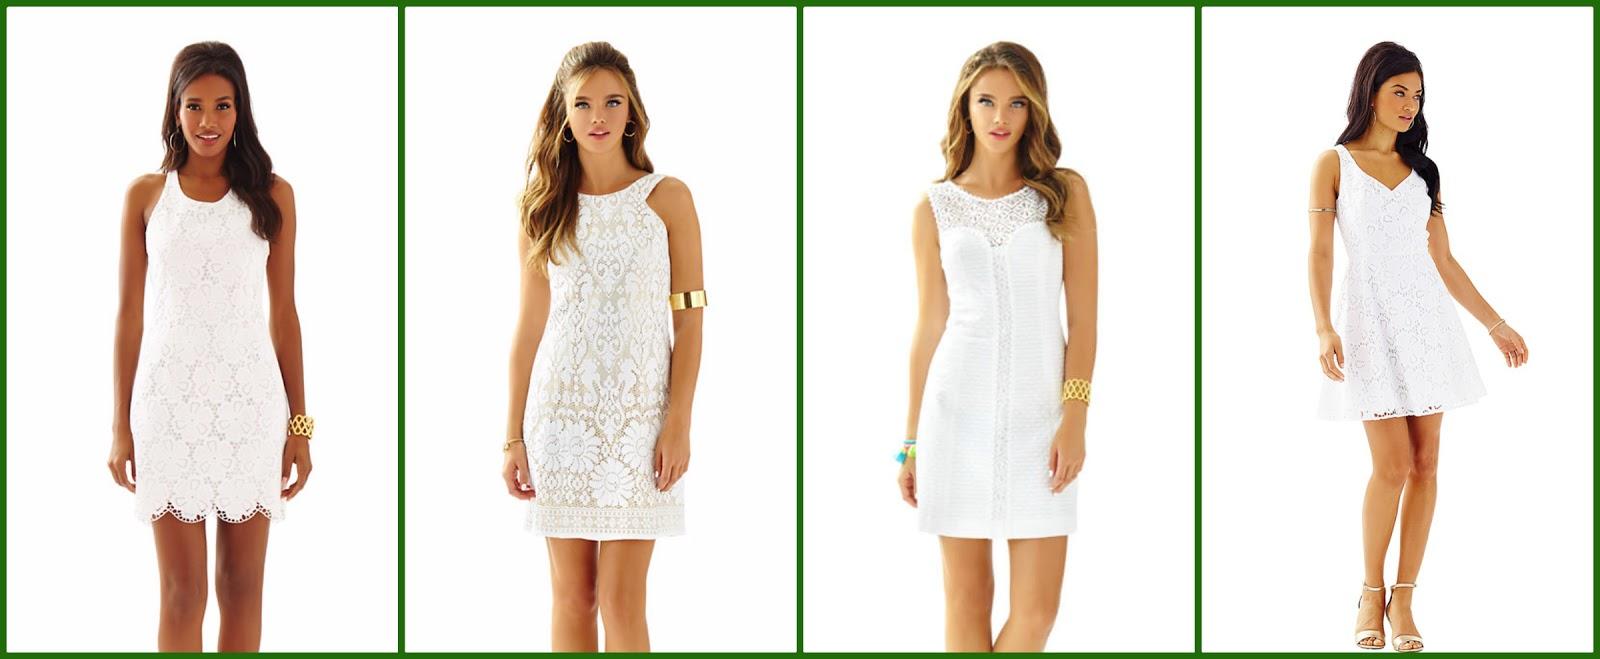 6193cf1f742e03 lilly pulitzer white dress sofia largo marla